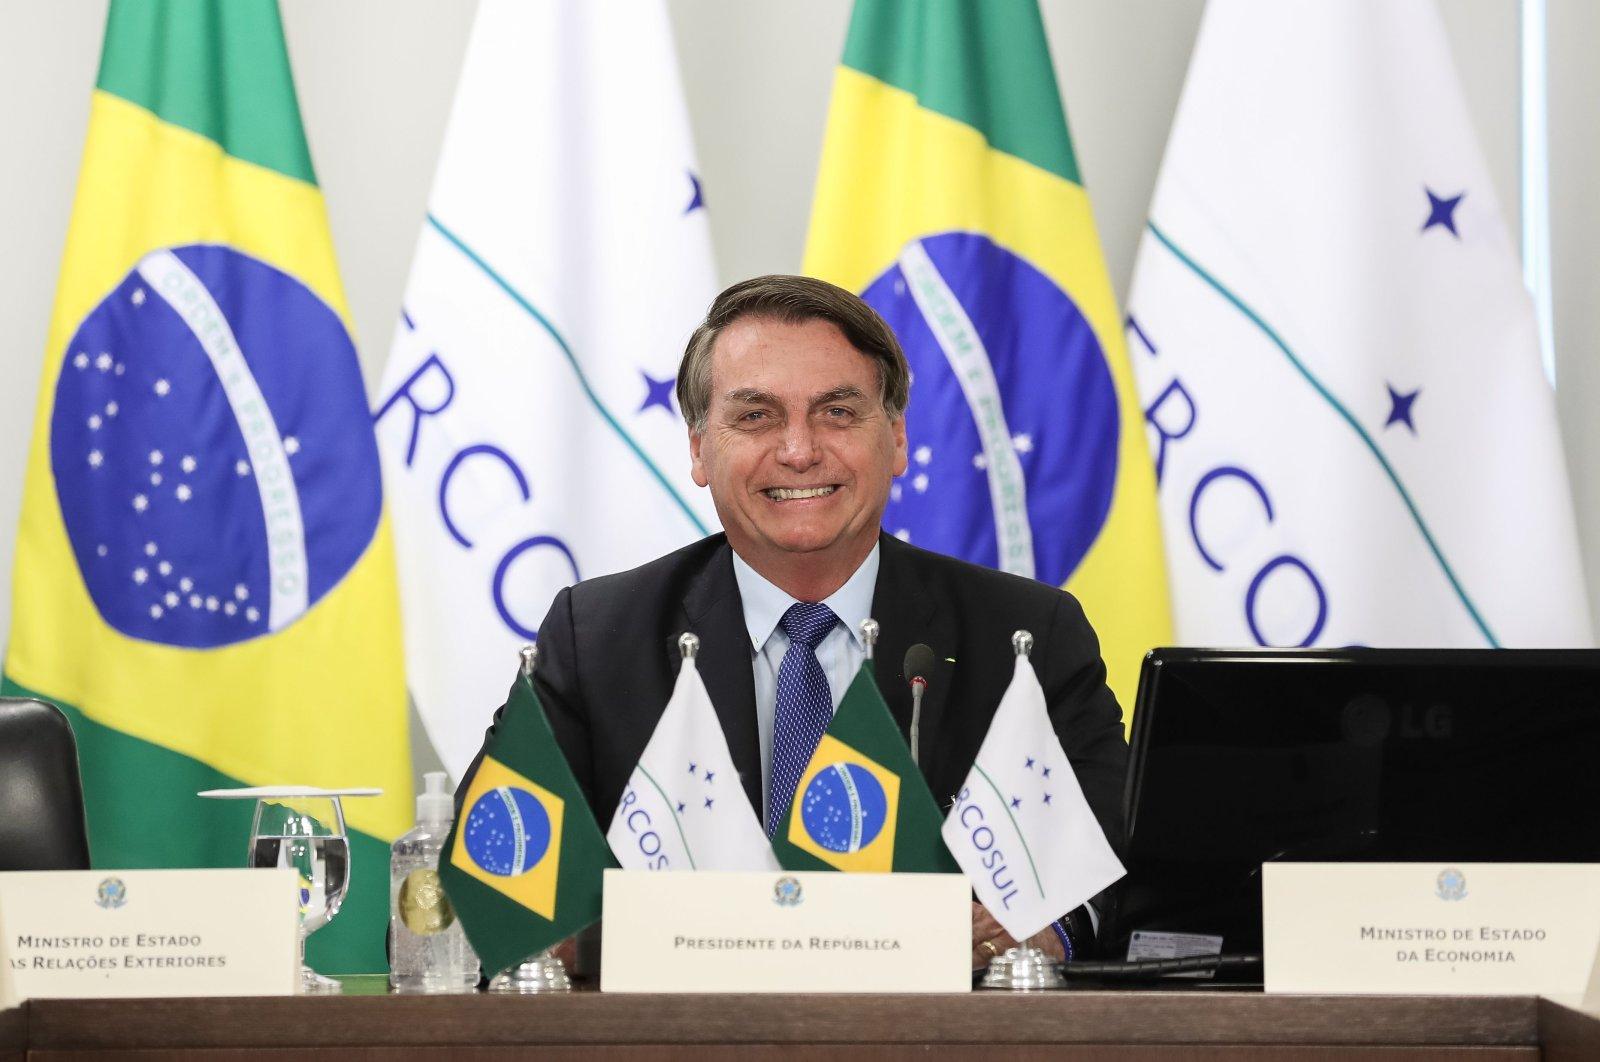 Brazilian President Jair Bolsonaro smiles during the first Mercosur Summit held via videoconference due to the coronavirus pandemic, Brazil, July 2, 2020. (AFP Photo)